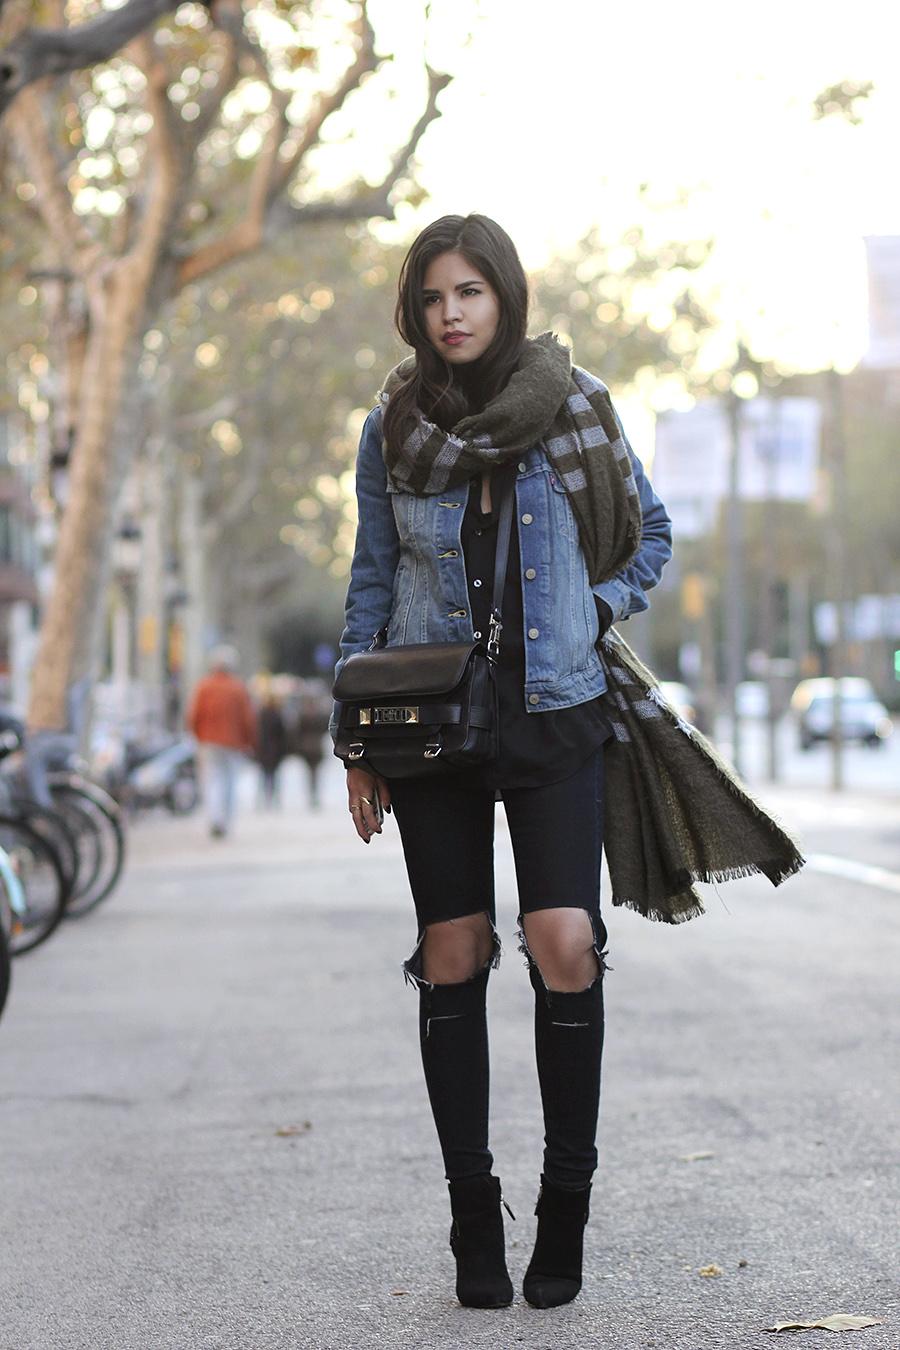 winter fashion accessories dress